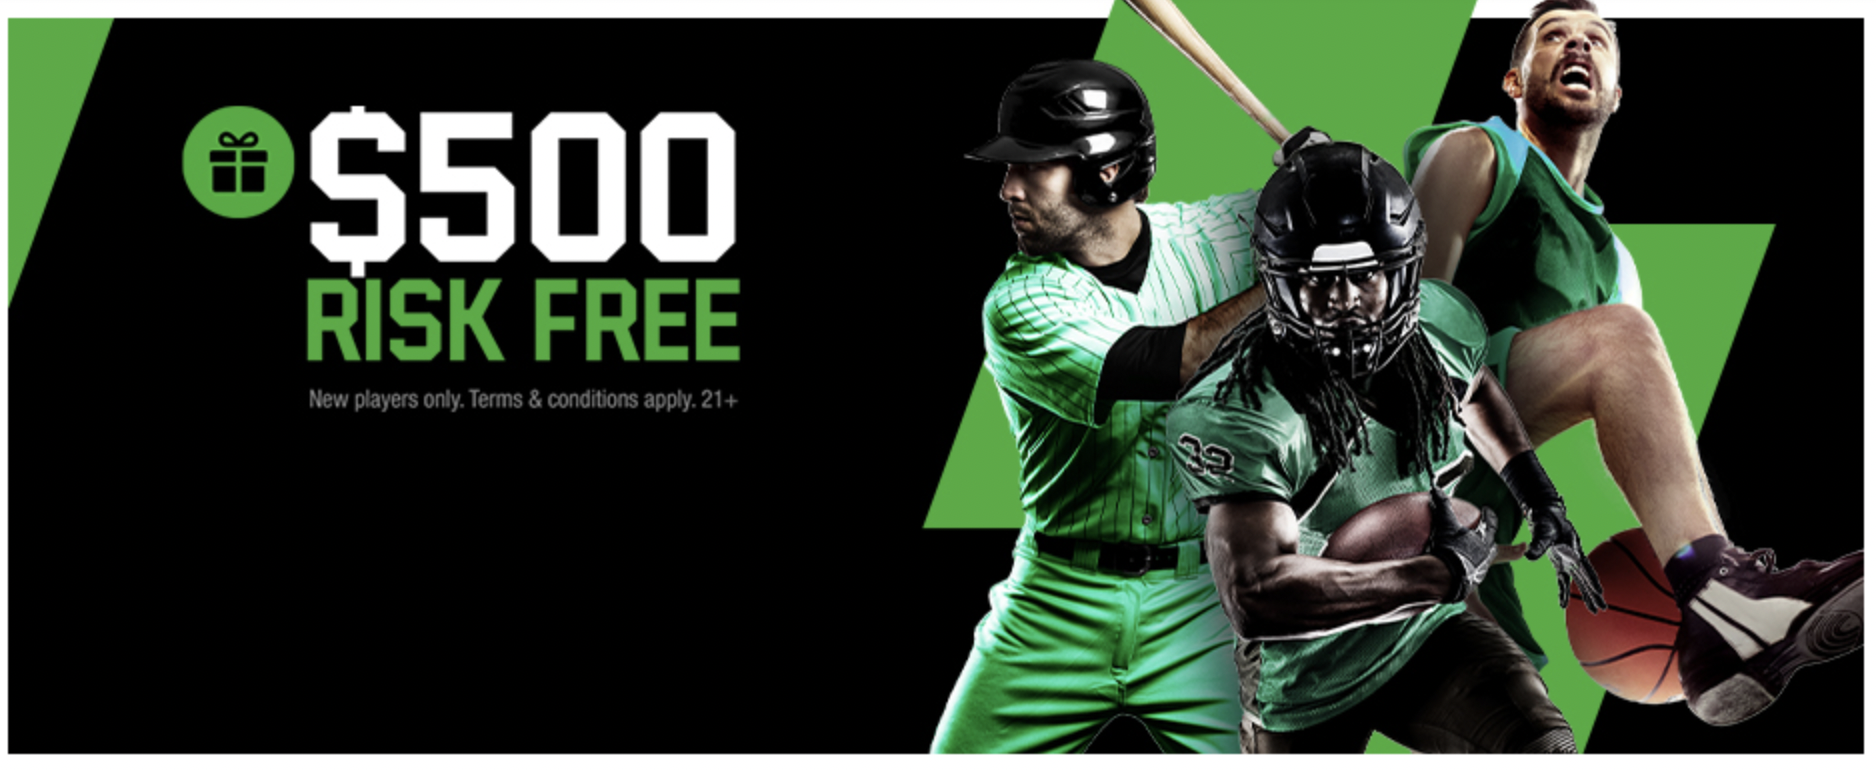 Unibet - Sportsbook - $500 Risk-Free Welcome Offer